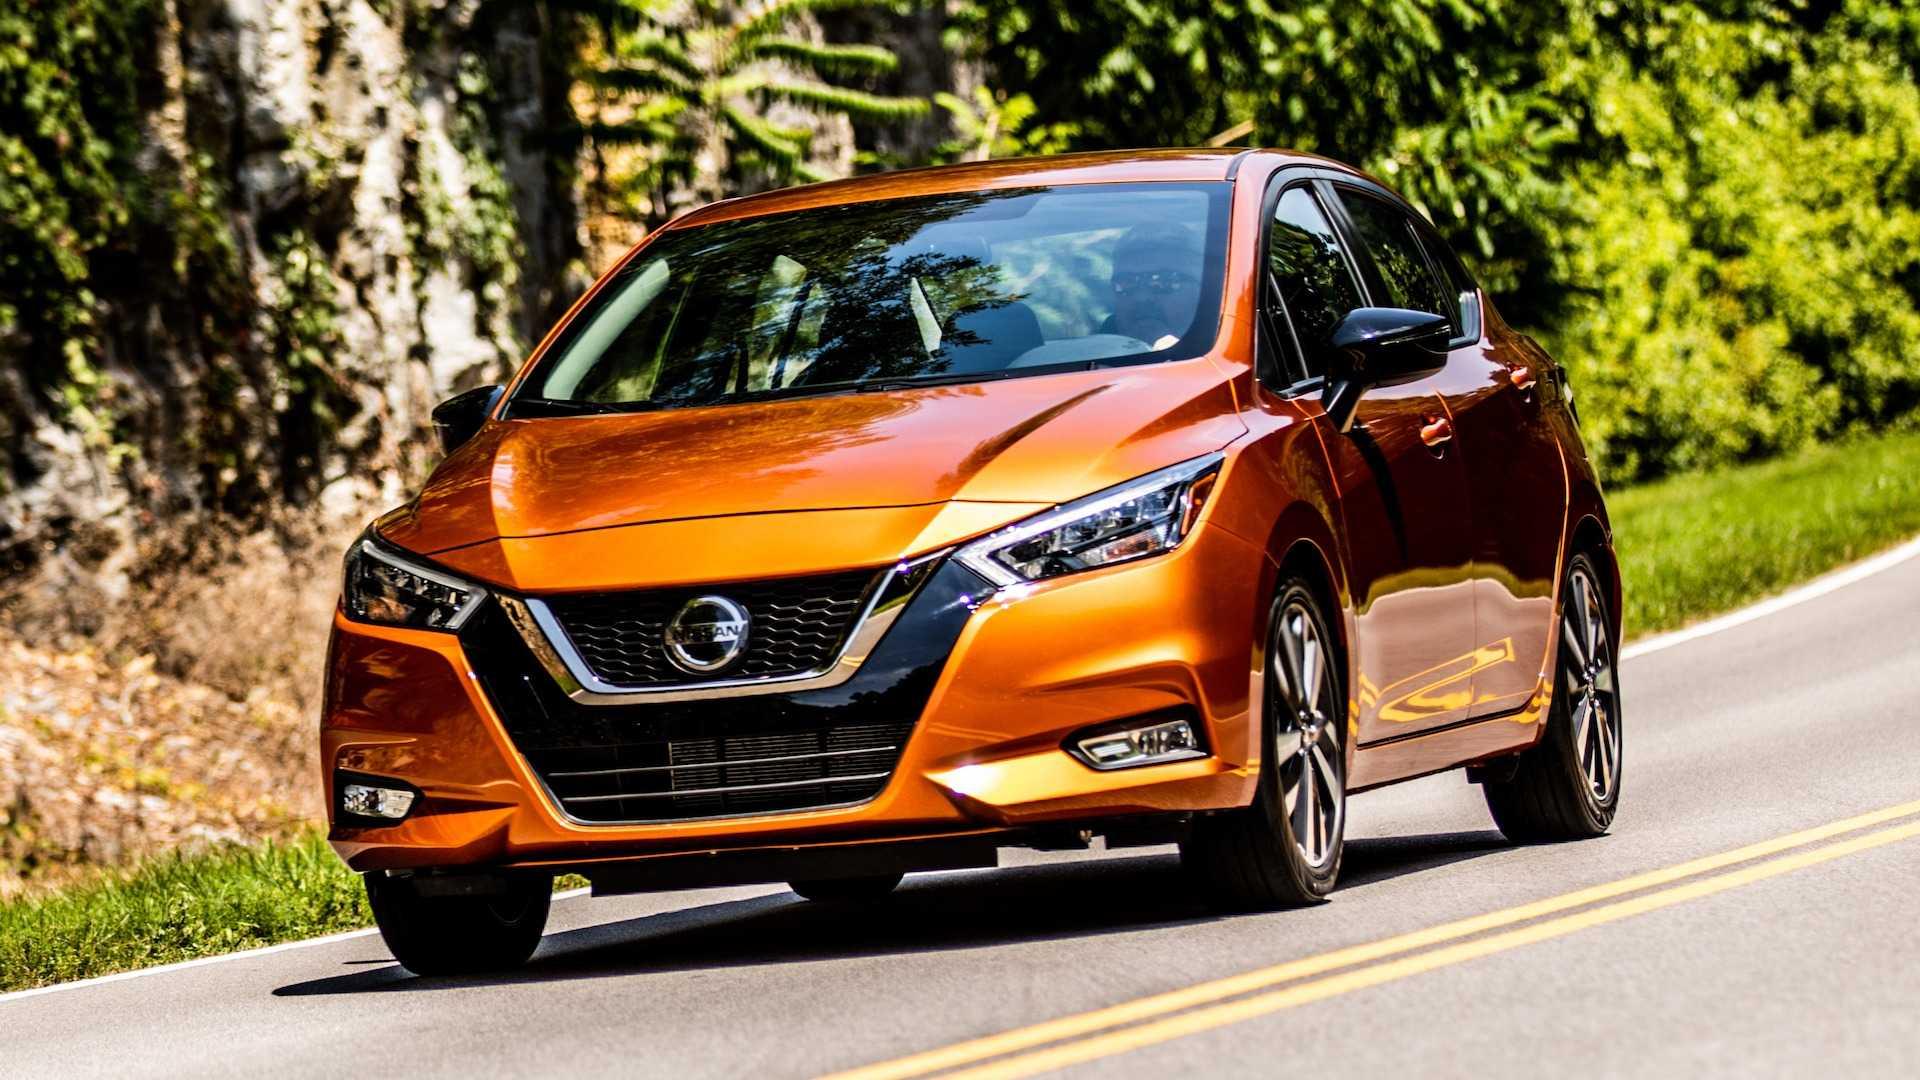 23 Great Nissan Versa 2020 Price Performance with Nissan Versa 2020 Price